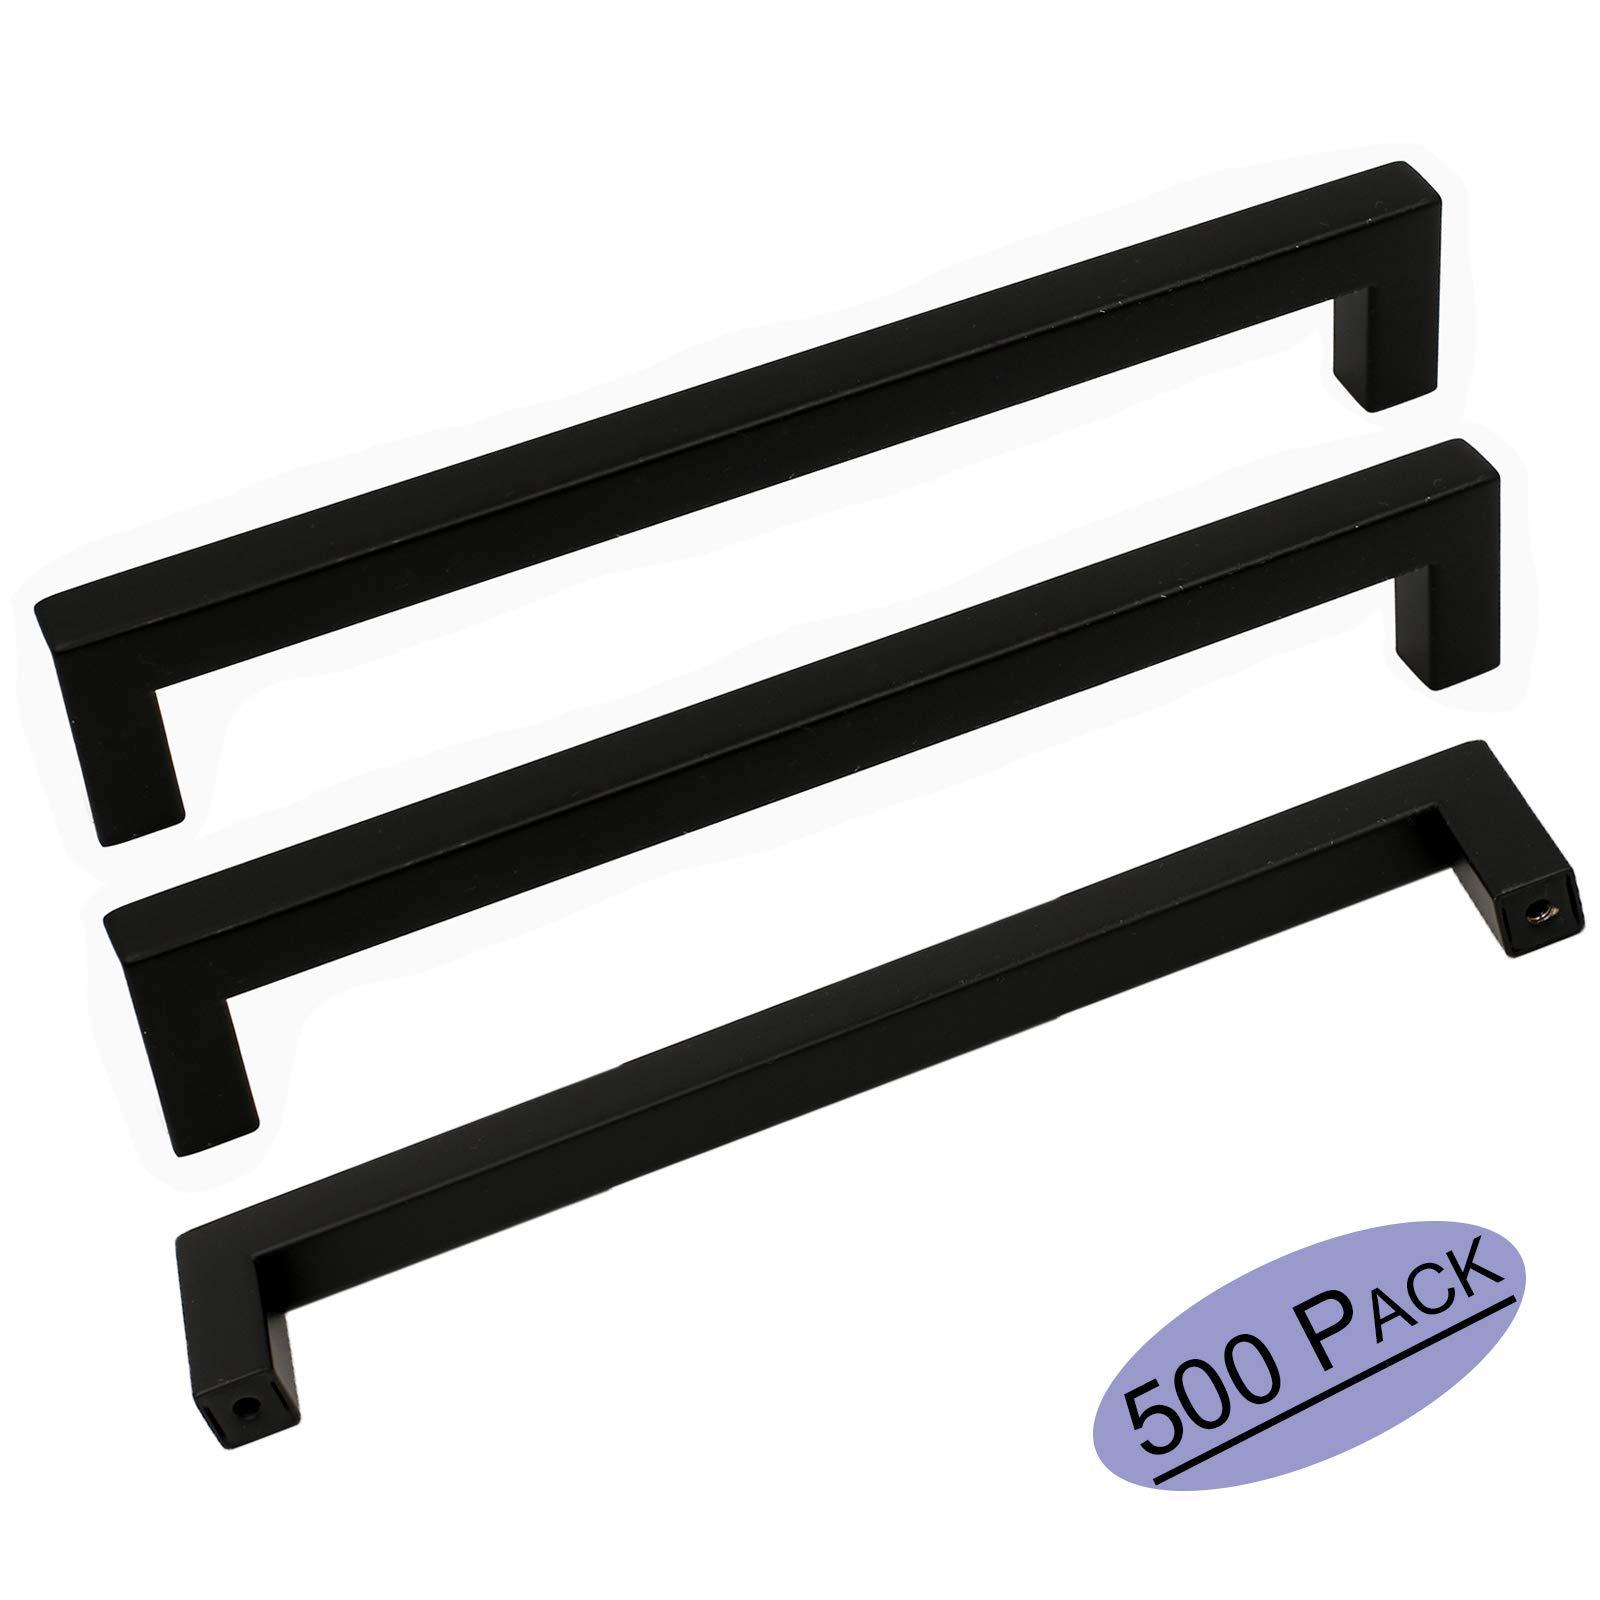 500Pack Goldenwarm Modern Cabinet Pulls Black Cabinet Hardware for Kitchen Cabinets Door Handles Flat Black Bathroom Drawer Pulls 8-4/5in(224mm) Center to Center Bar Pulls